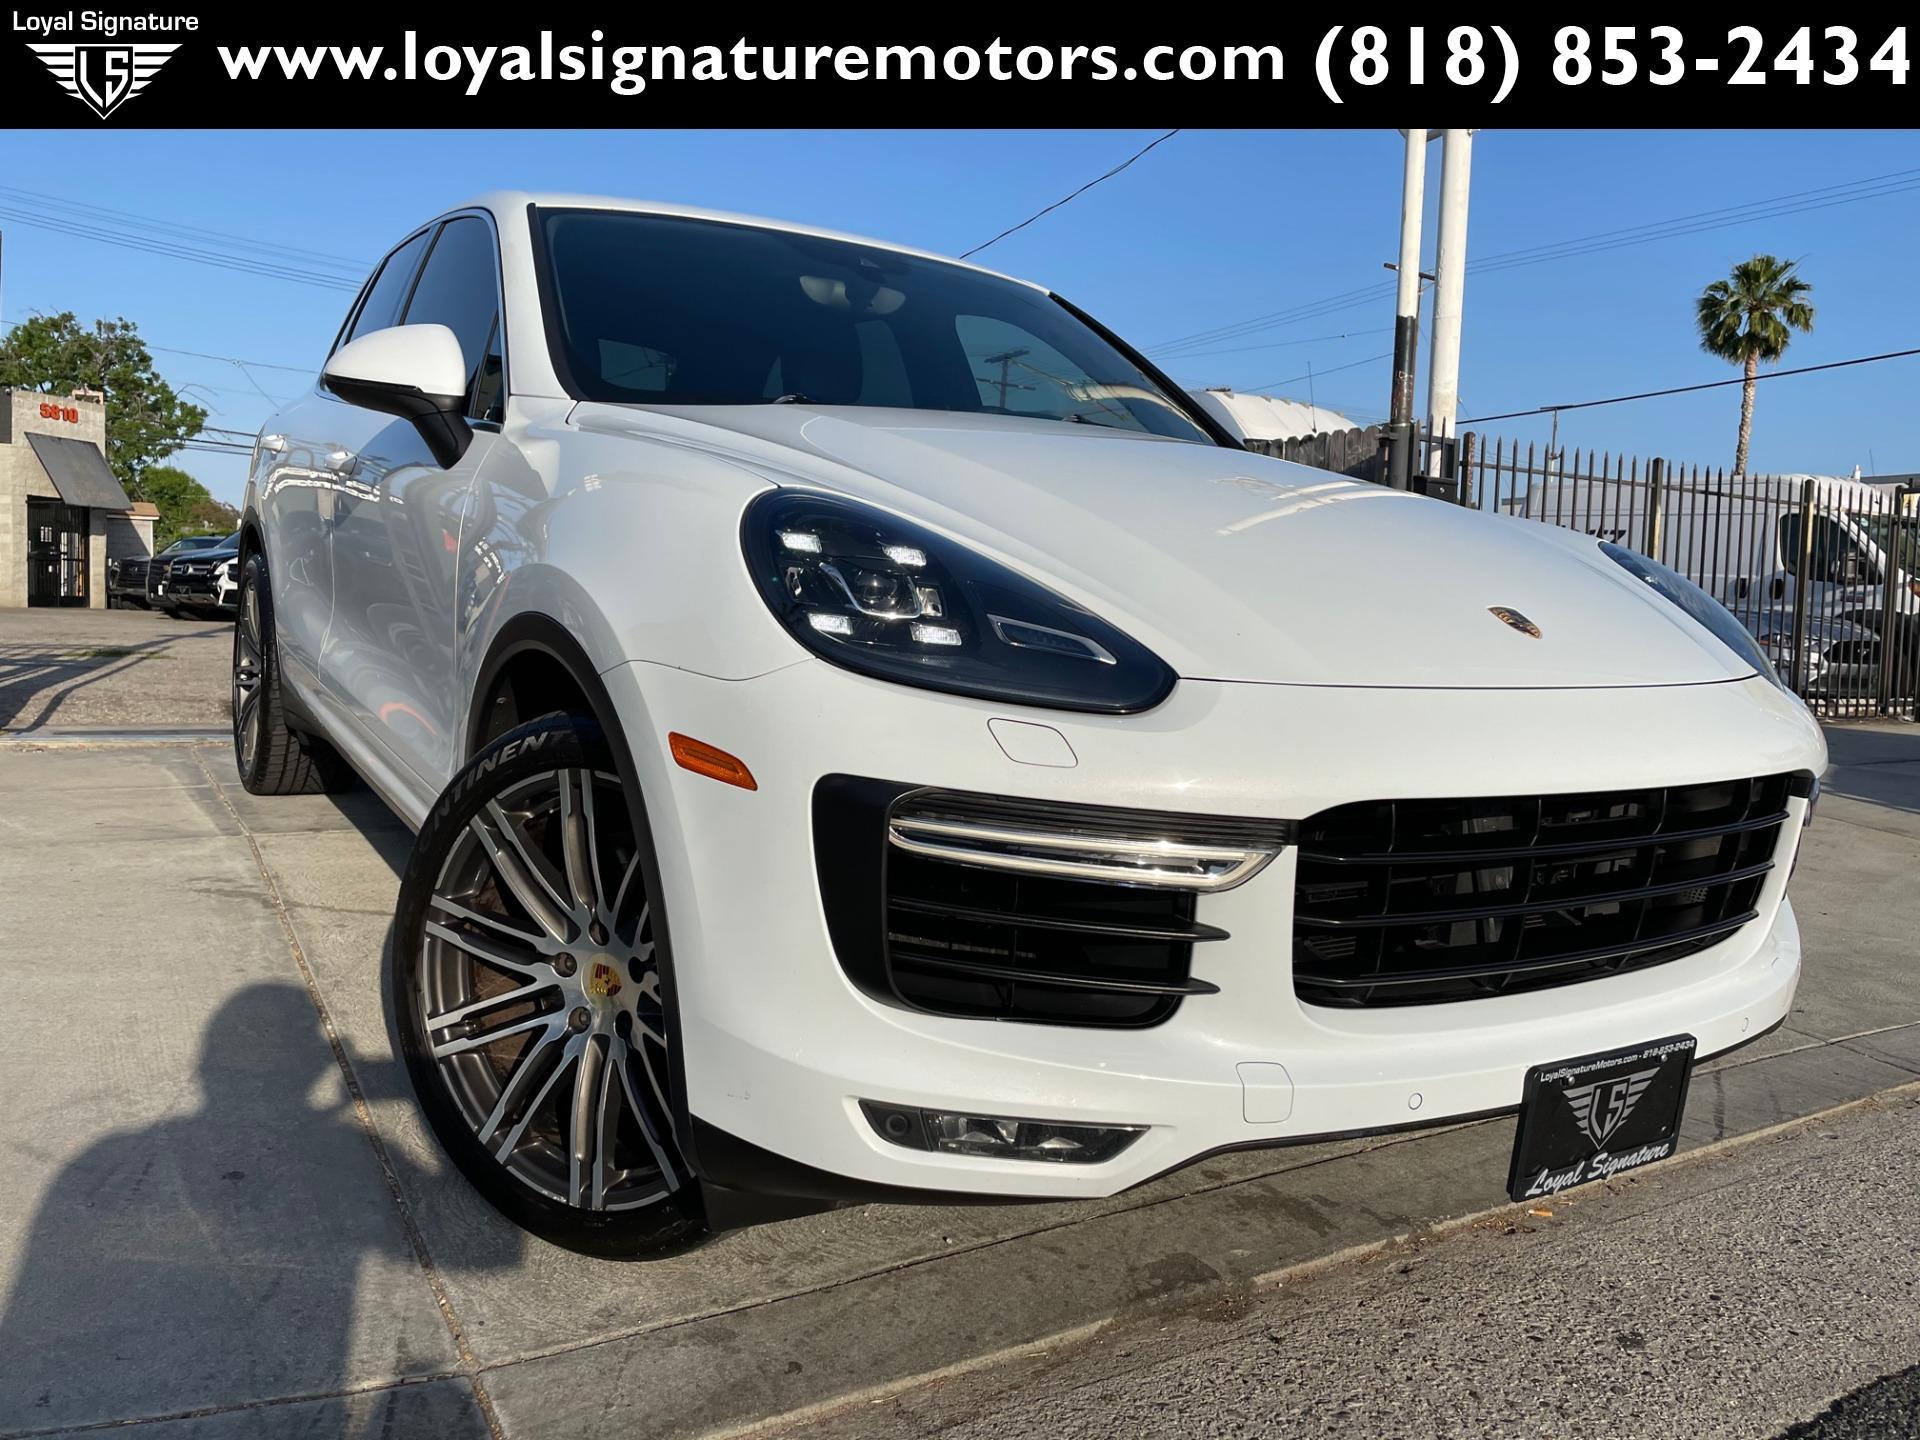 Used 2015 Porsche Cayenne Turbo   Van Nuys, CA